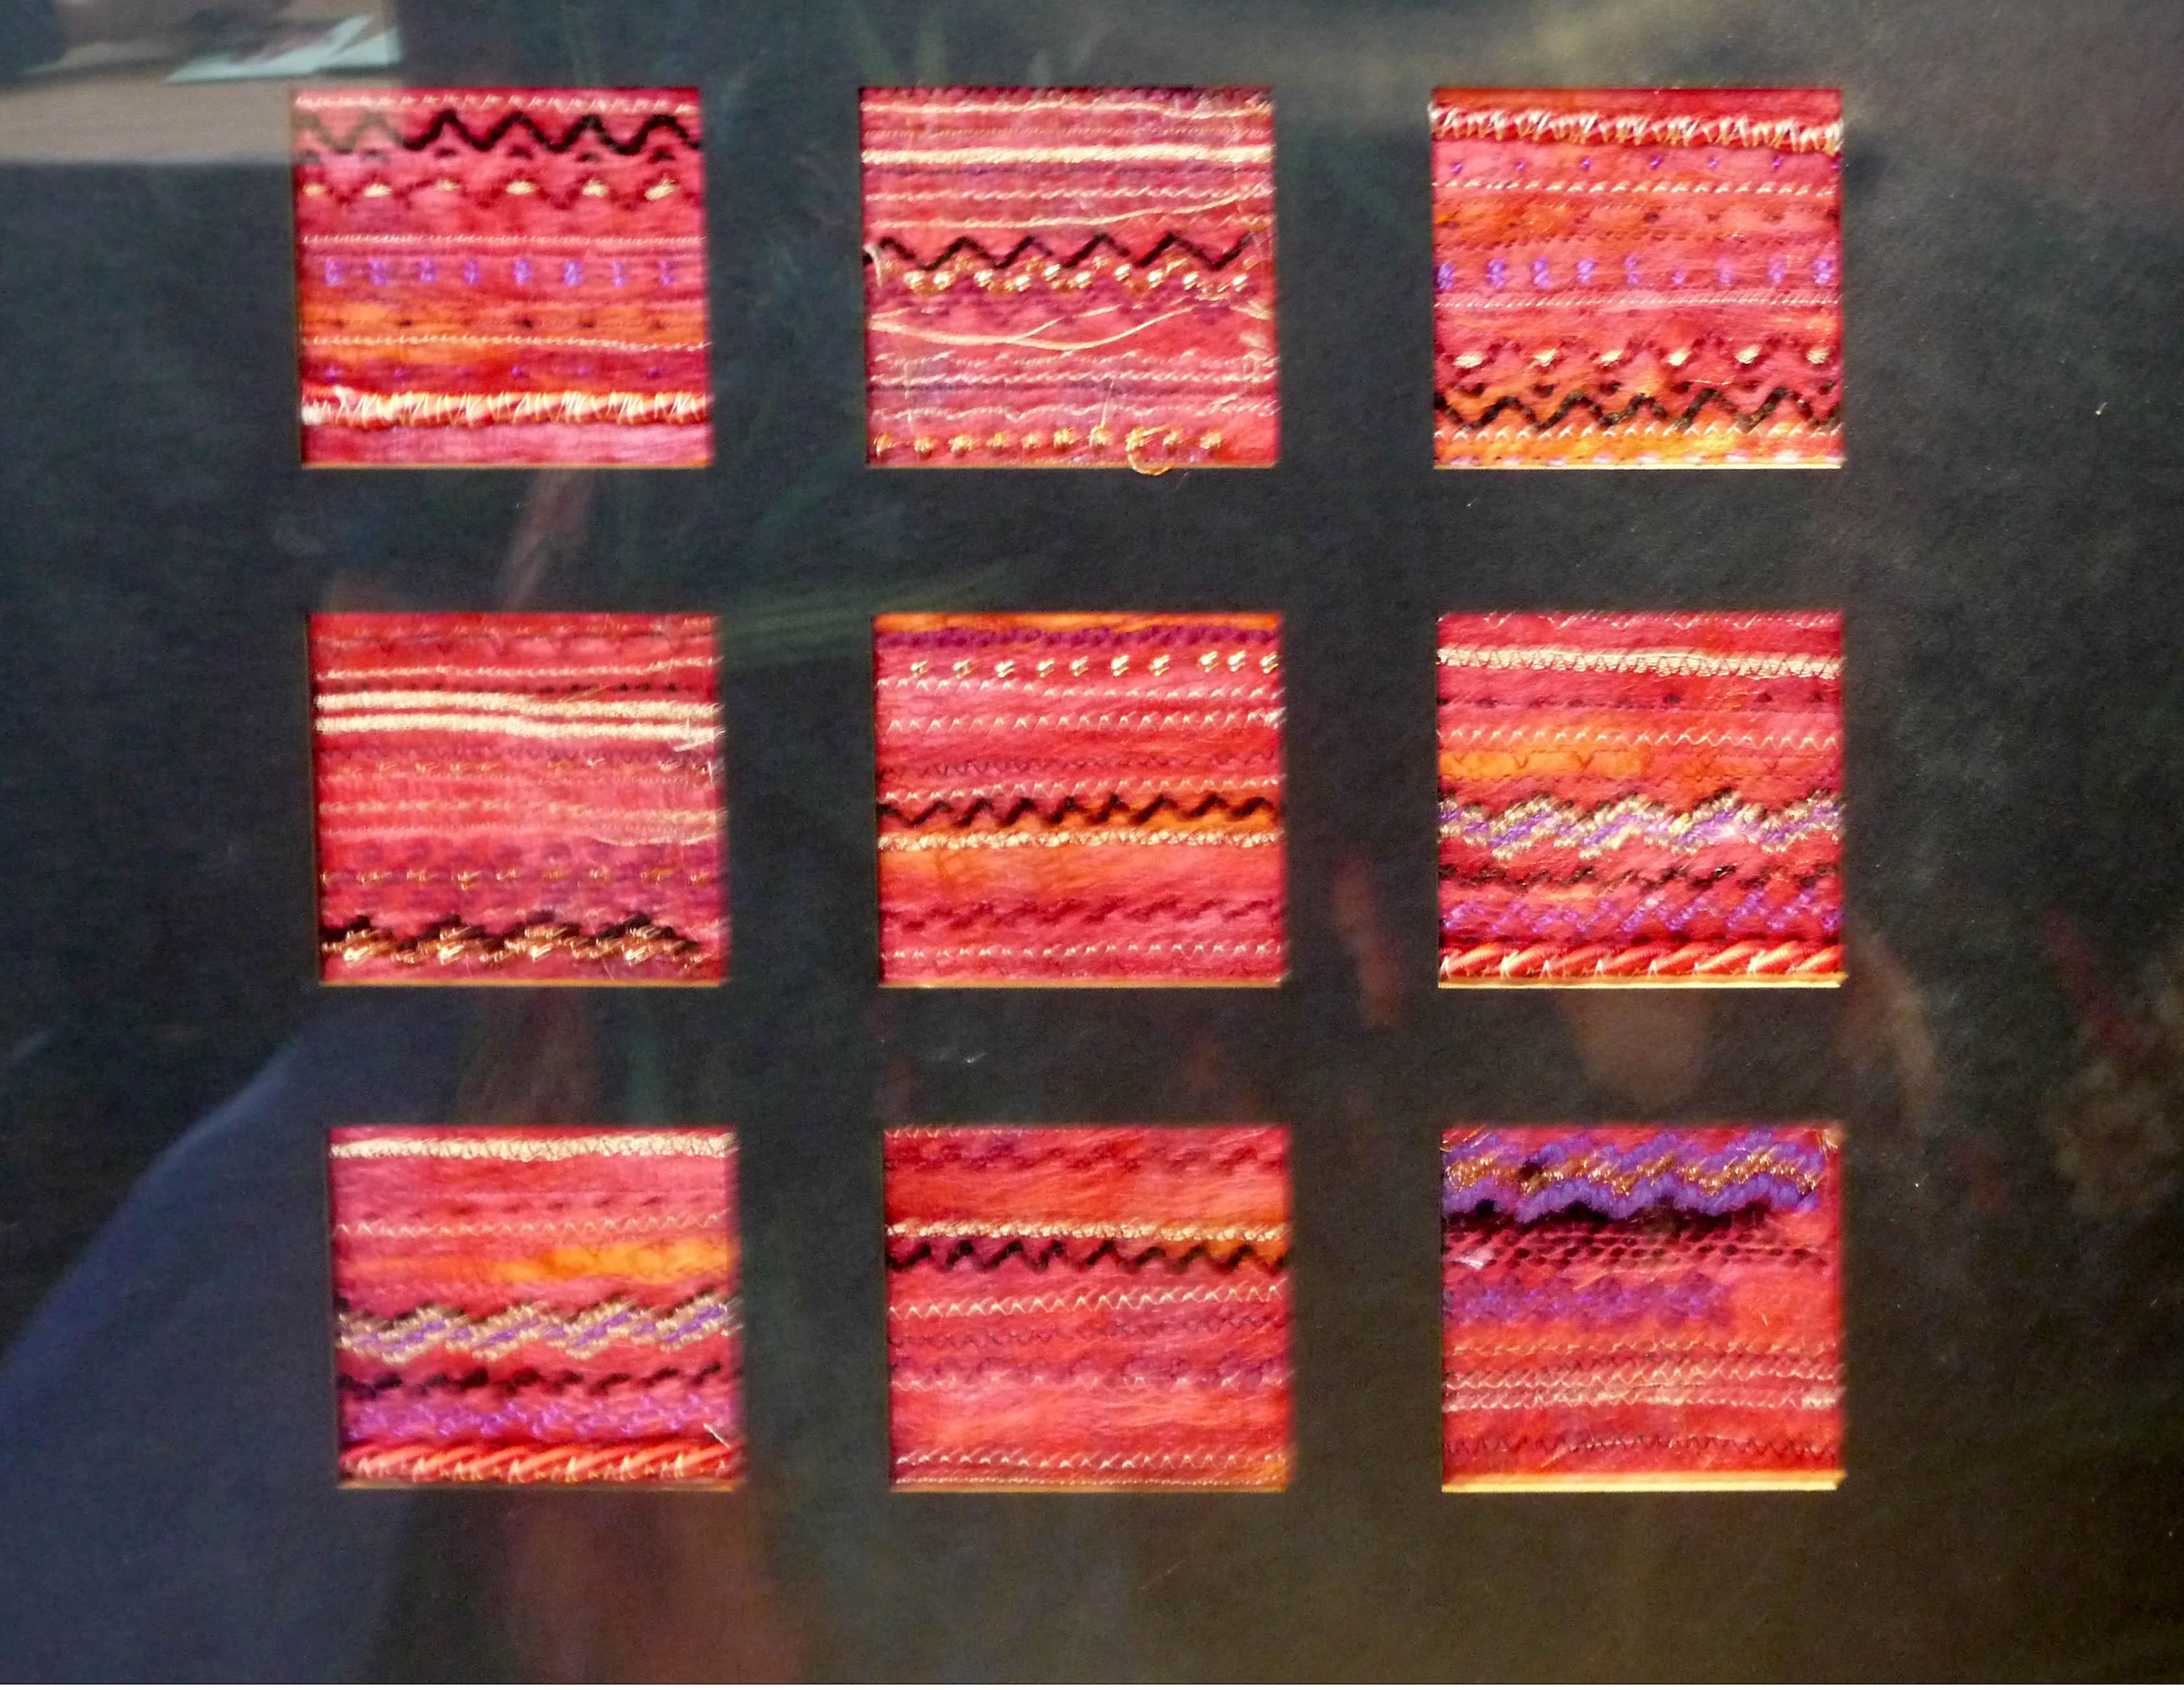 machine embroidery by Gemma Blackburn, Liverpool Hope Univ Art Degree Show 2014